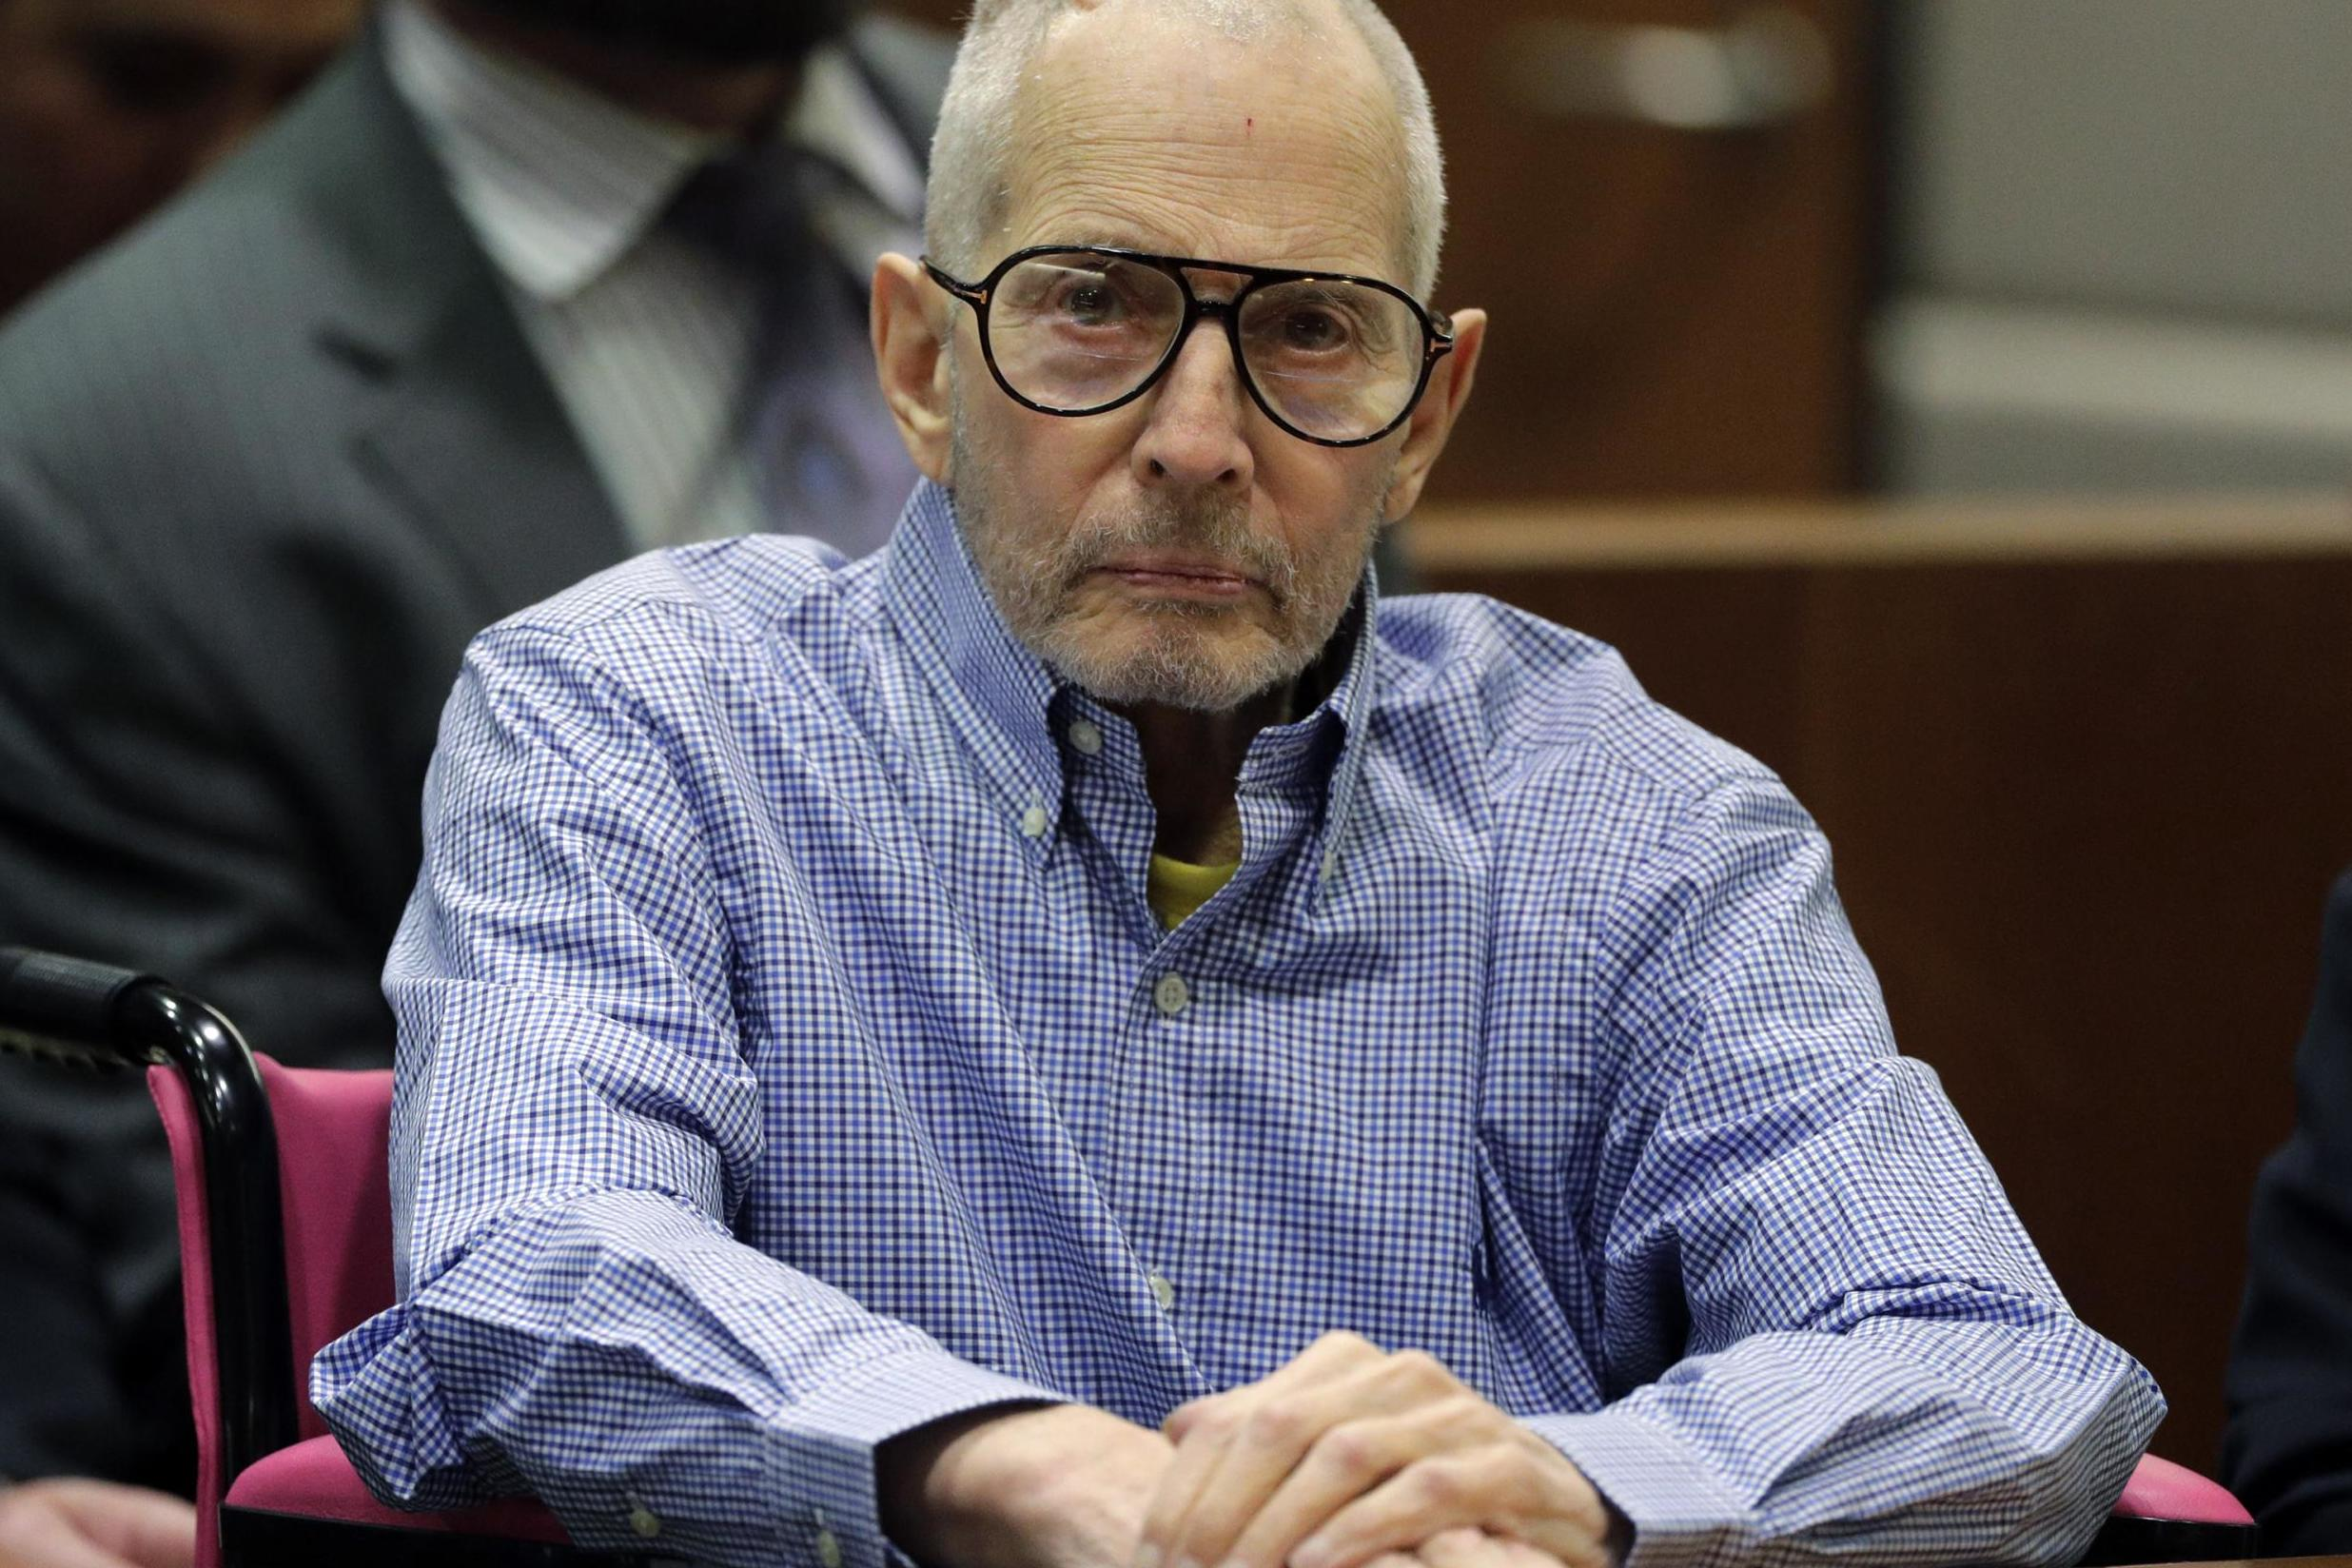 Robert Durst: Judge dismisses wrongful death lawsuit accusing real estate heir of murdering his wife